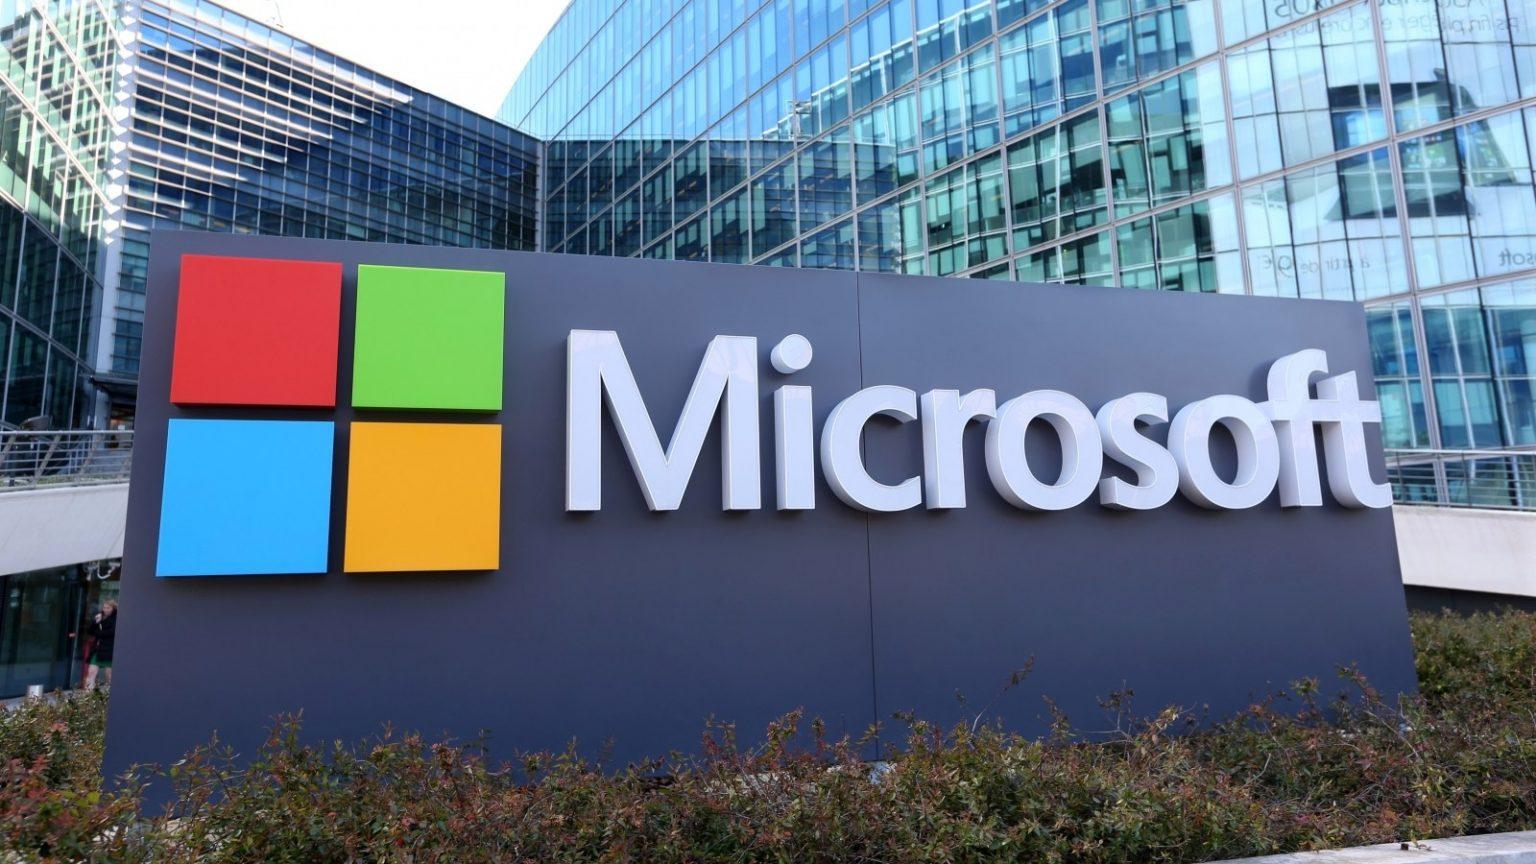 India-Microsoft MoU on Digital Transformation of Tribal Schools | గిరిజన పాఠశాలల డిజిటల్ పరివర్తనపై భారత్-మైక్రోసాఫ్ట్ ఒప్పందం |_40.1